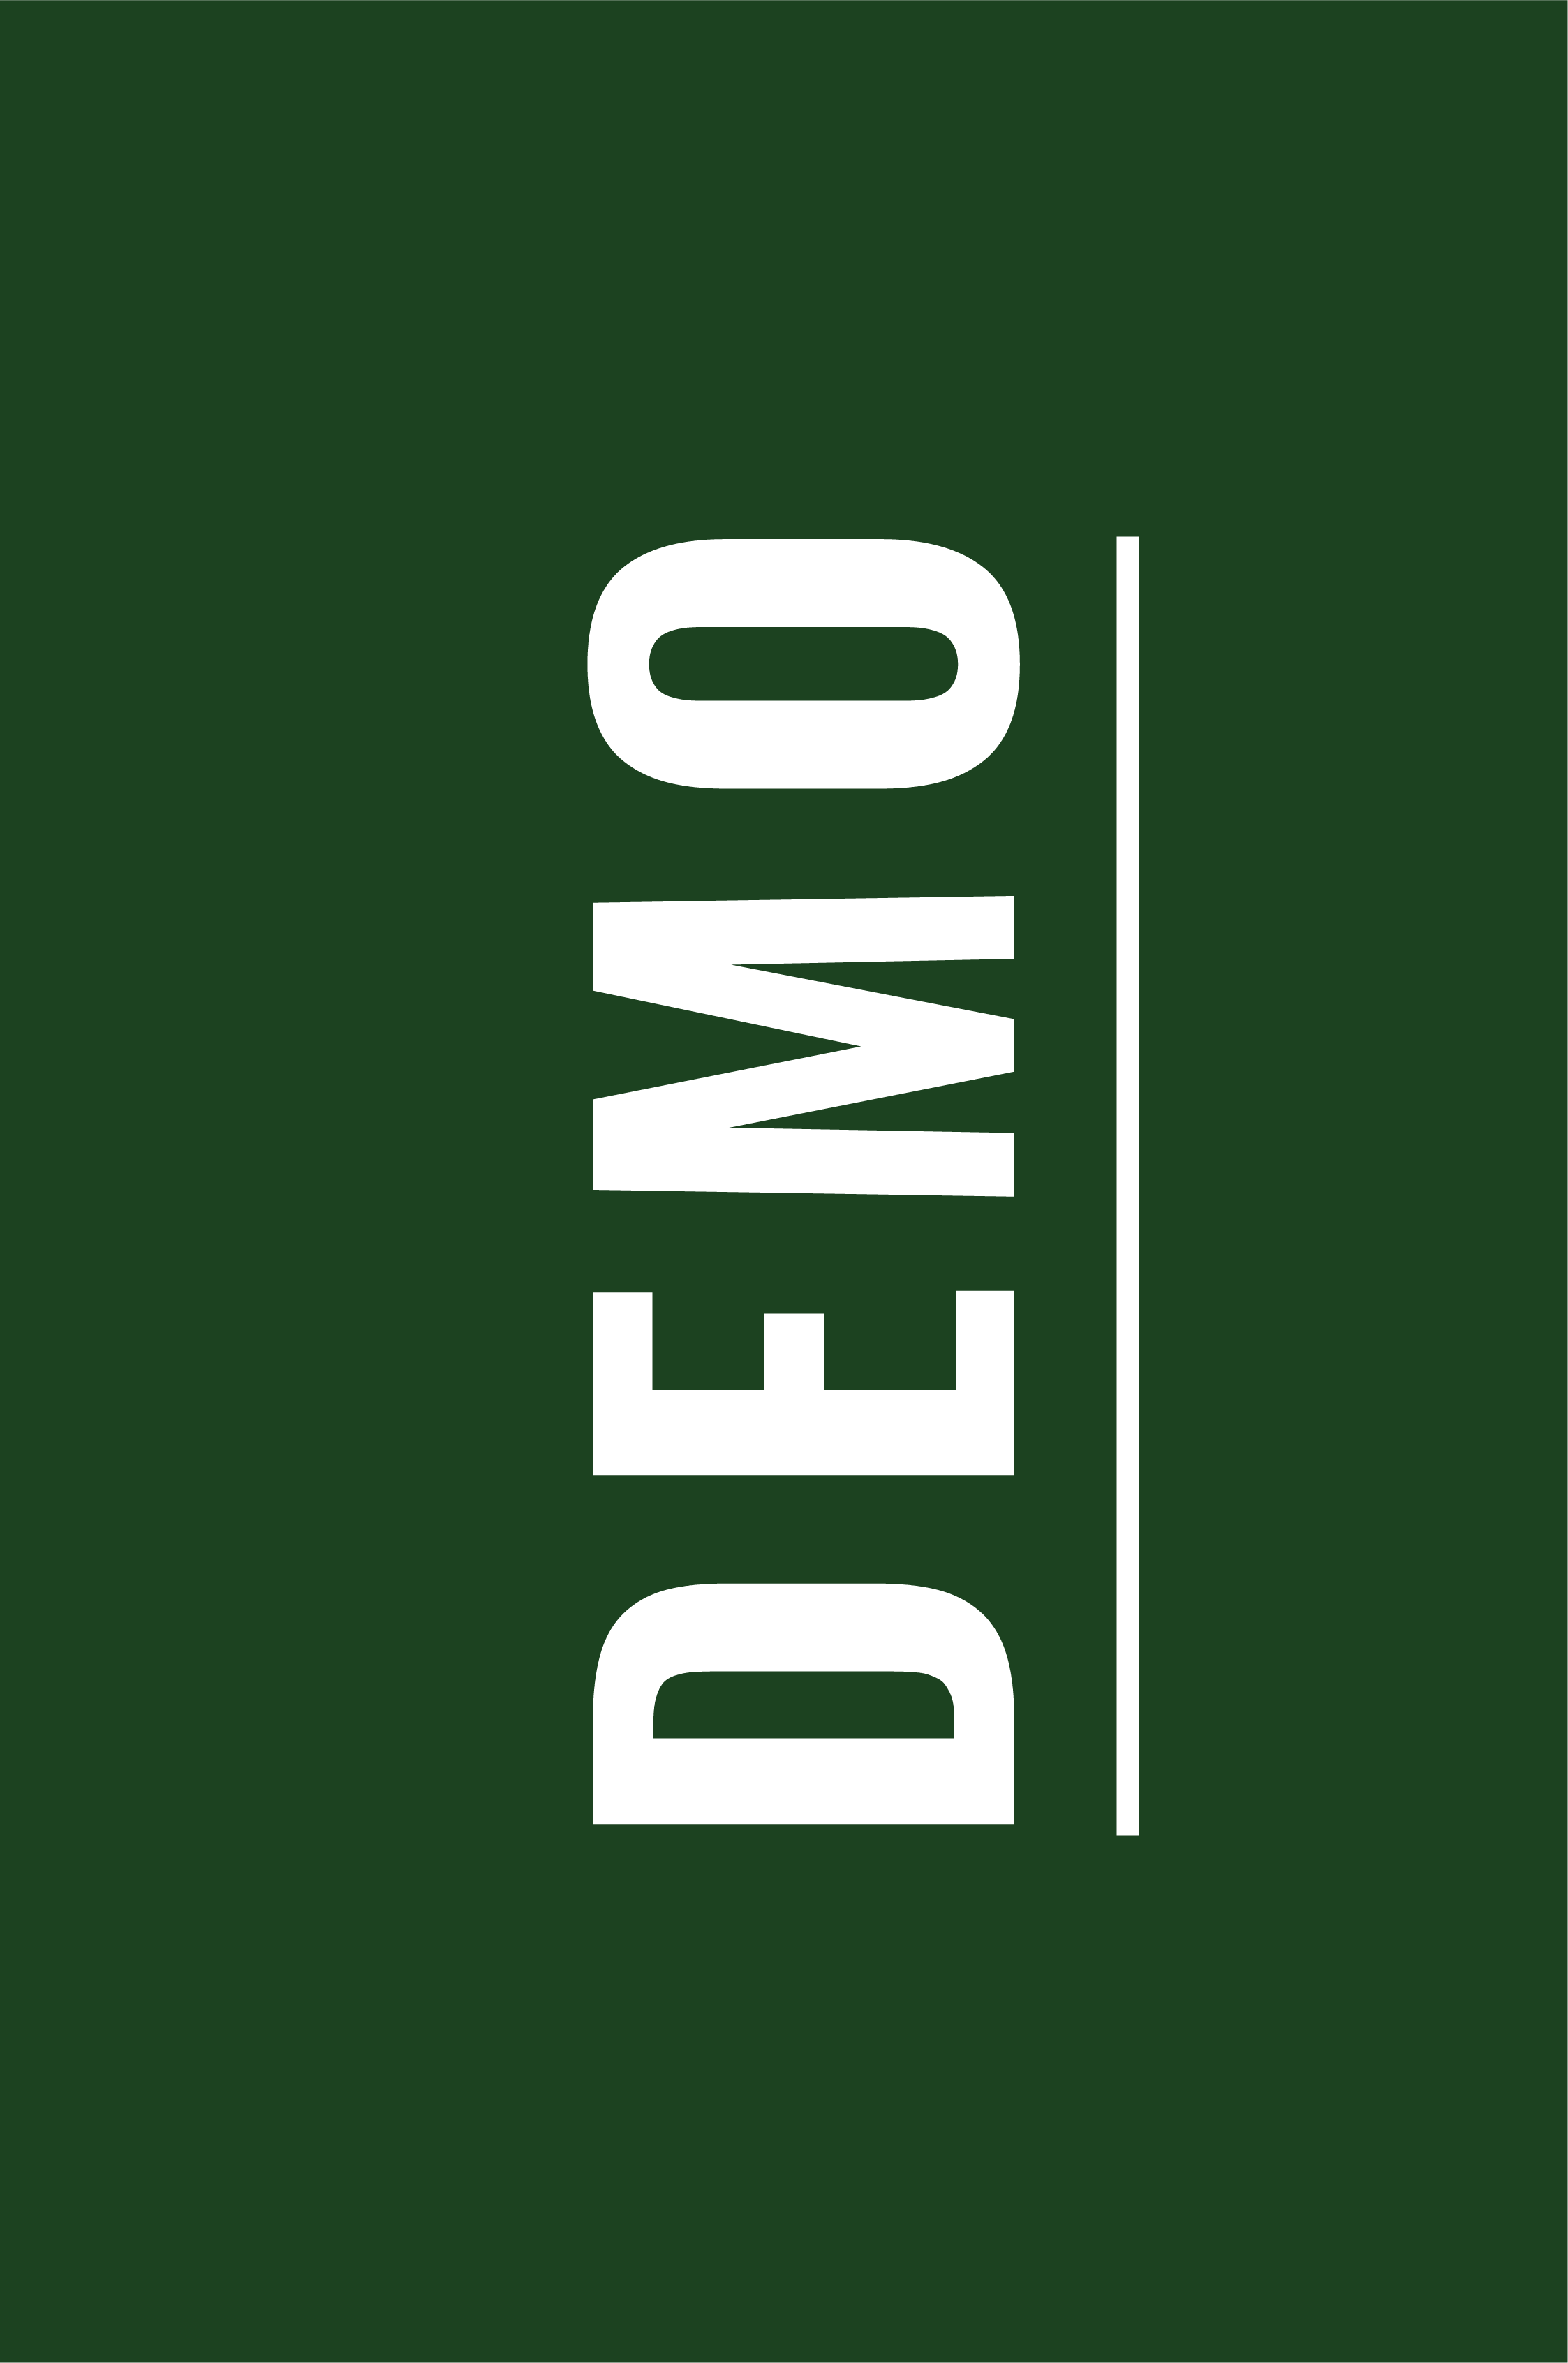 DEMO_Box.png